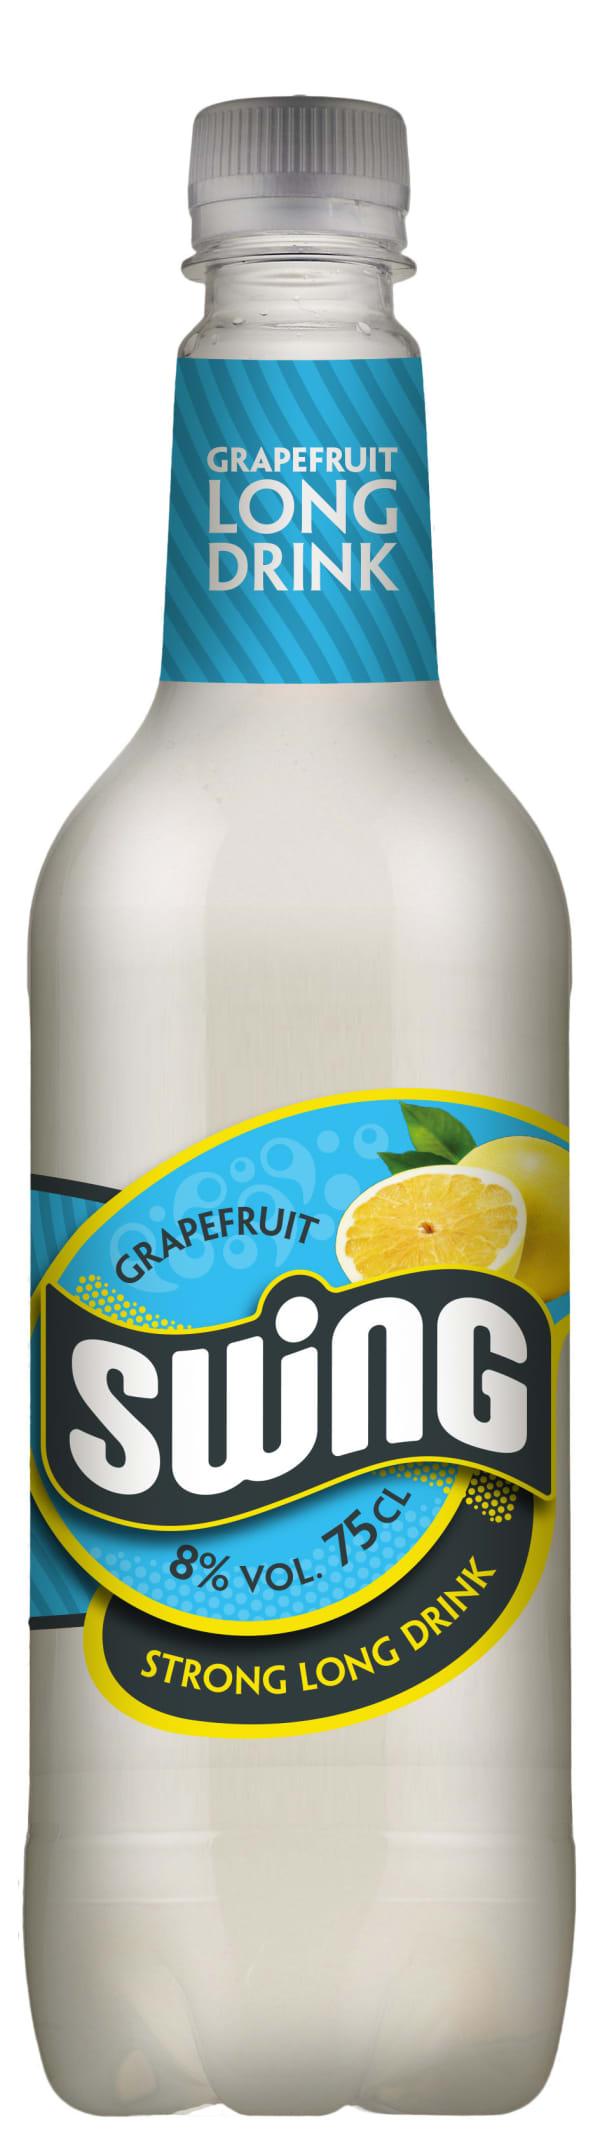 Swing Grapefruit Strong Long Drink plastflaska